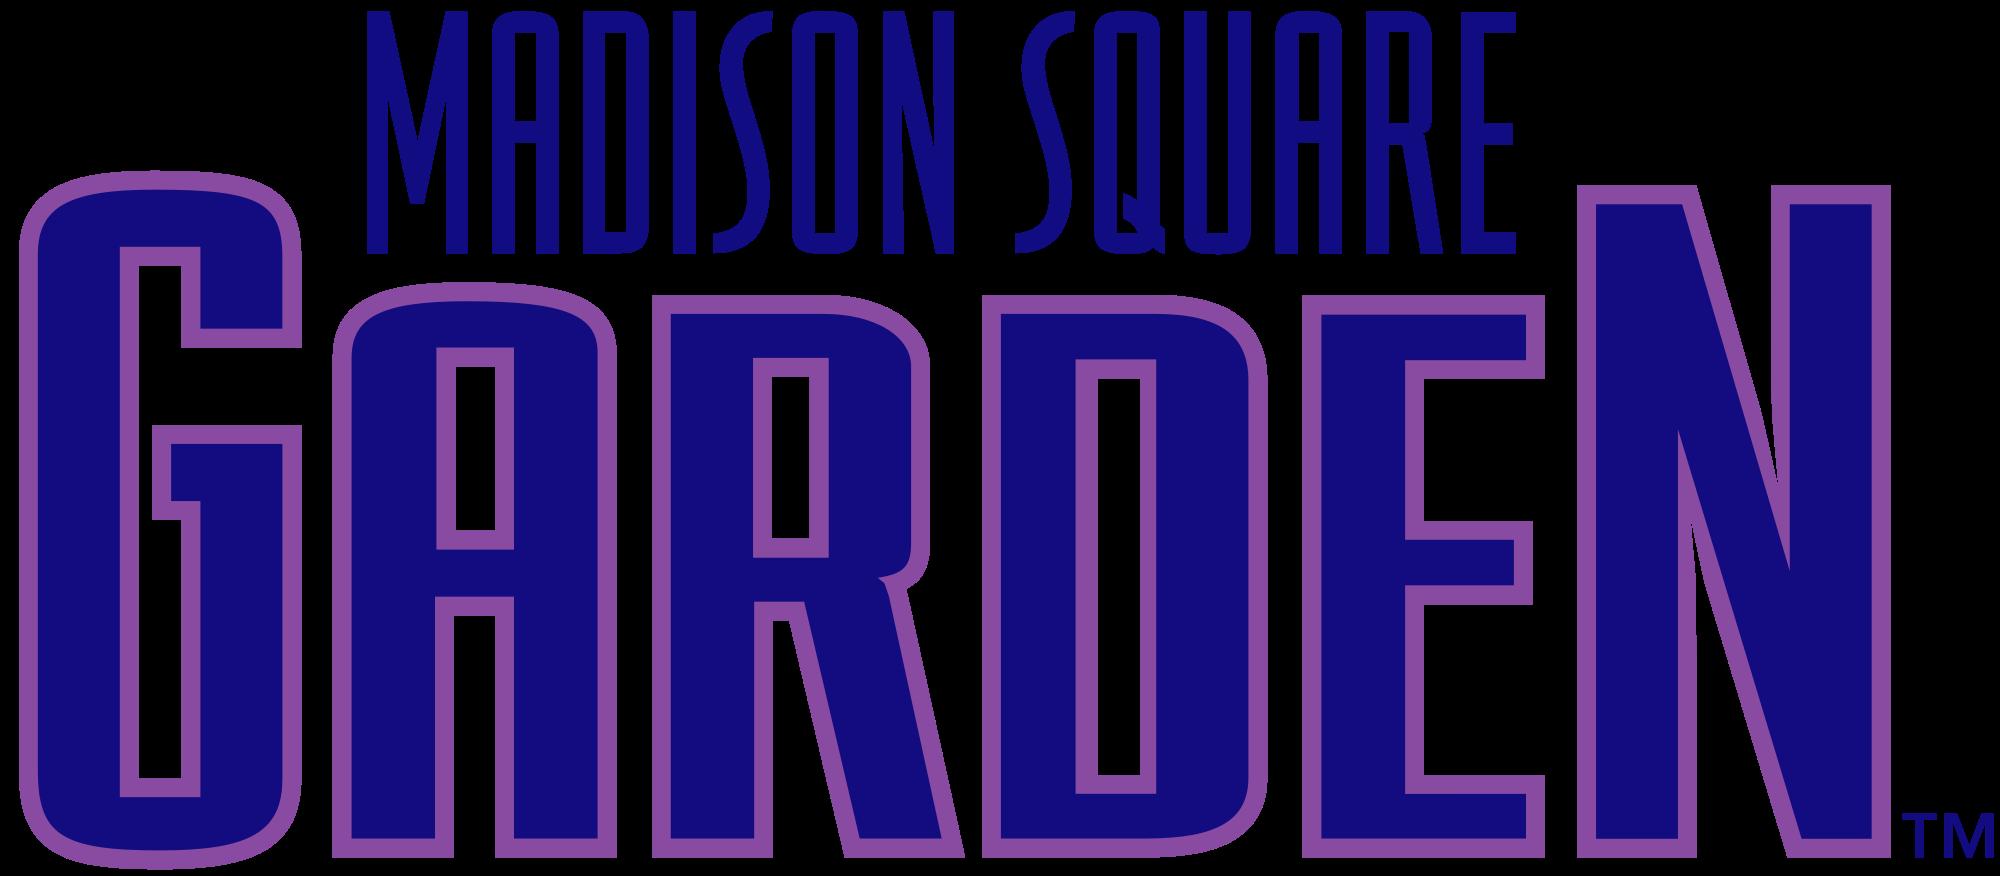 Madison_Square_Garden.jpg